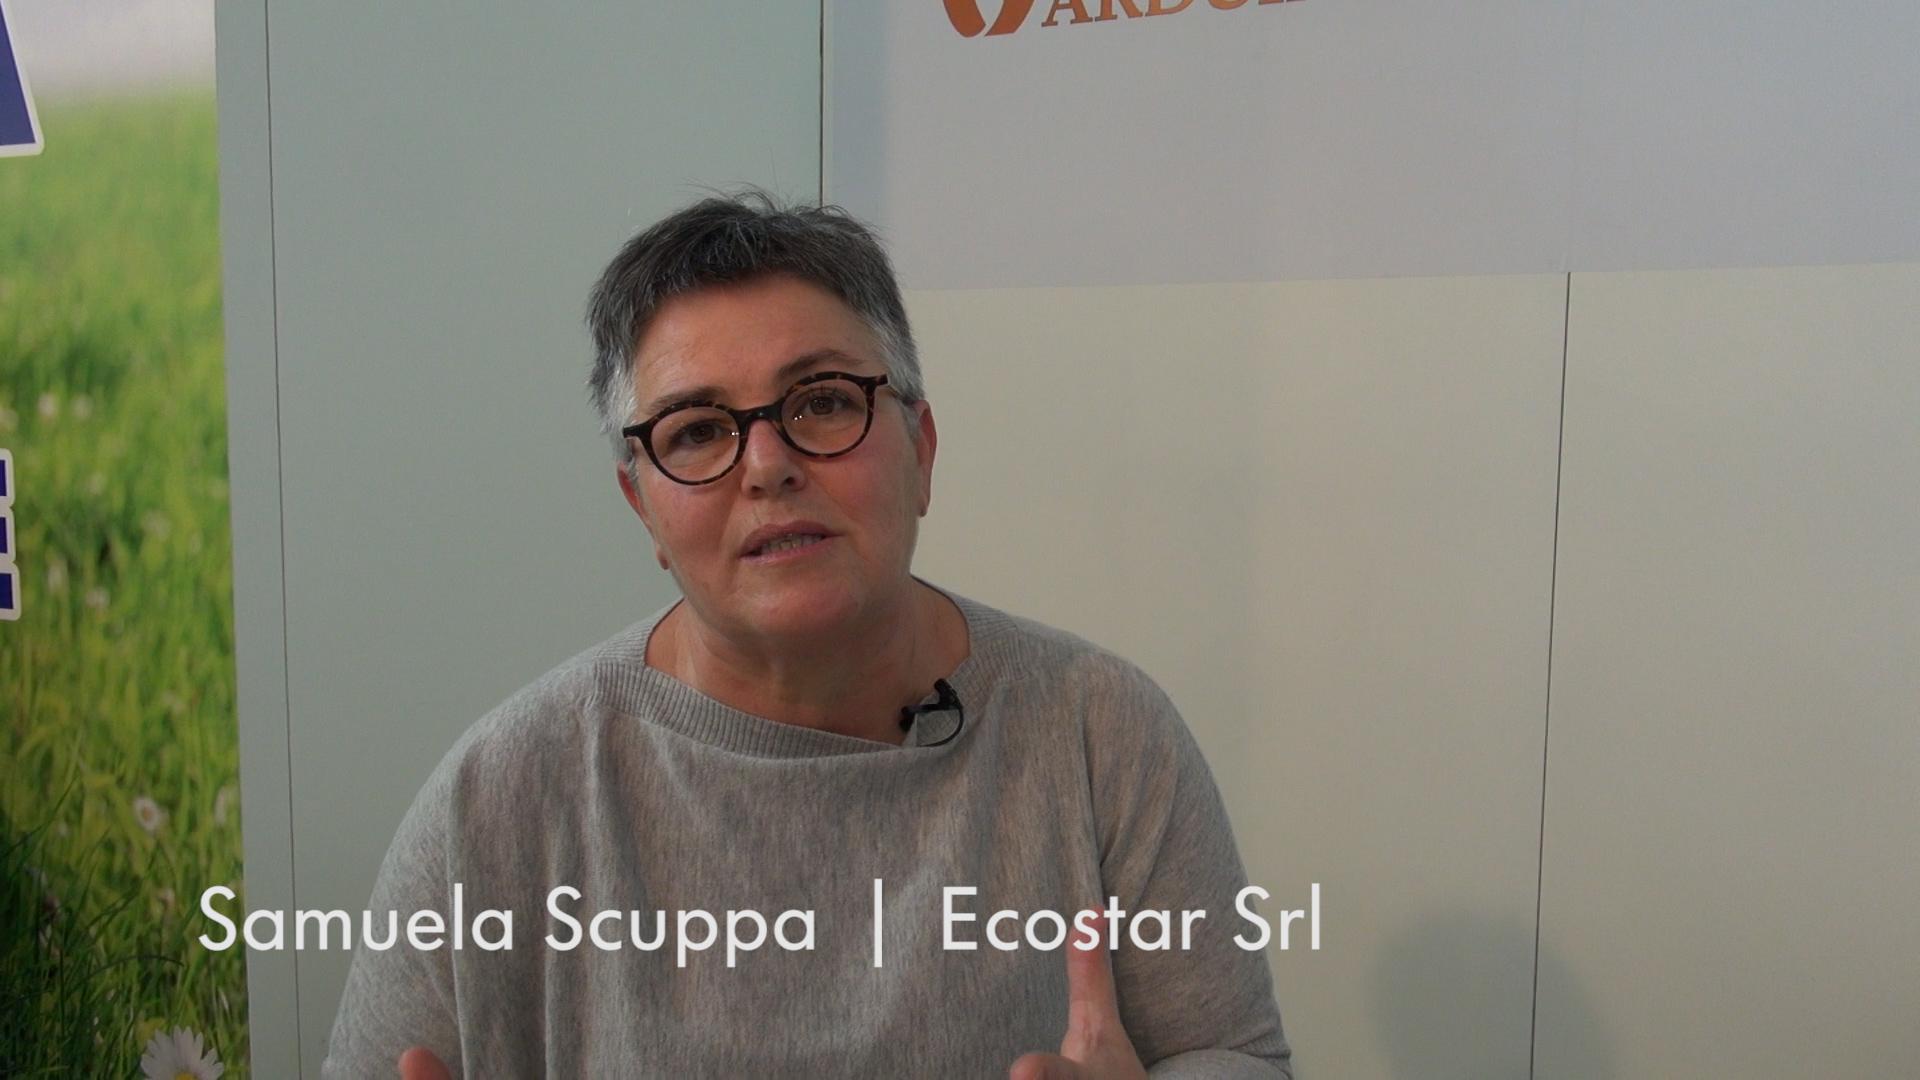 Samuela Scuppa Ecostar